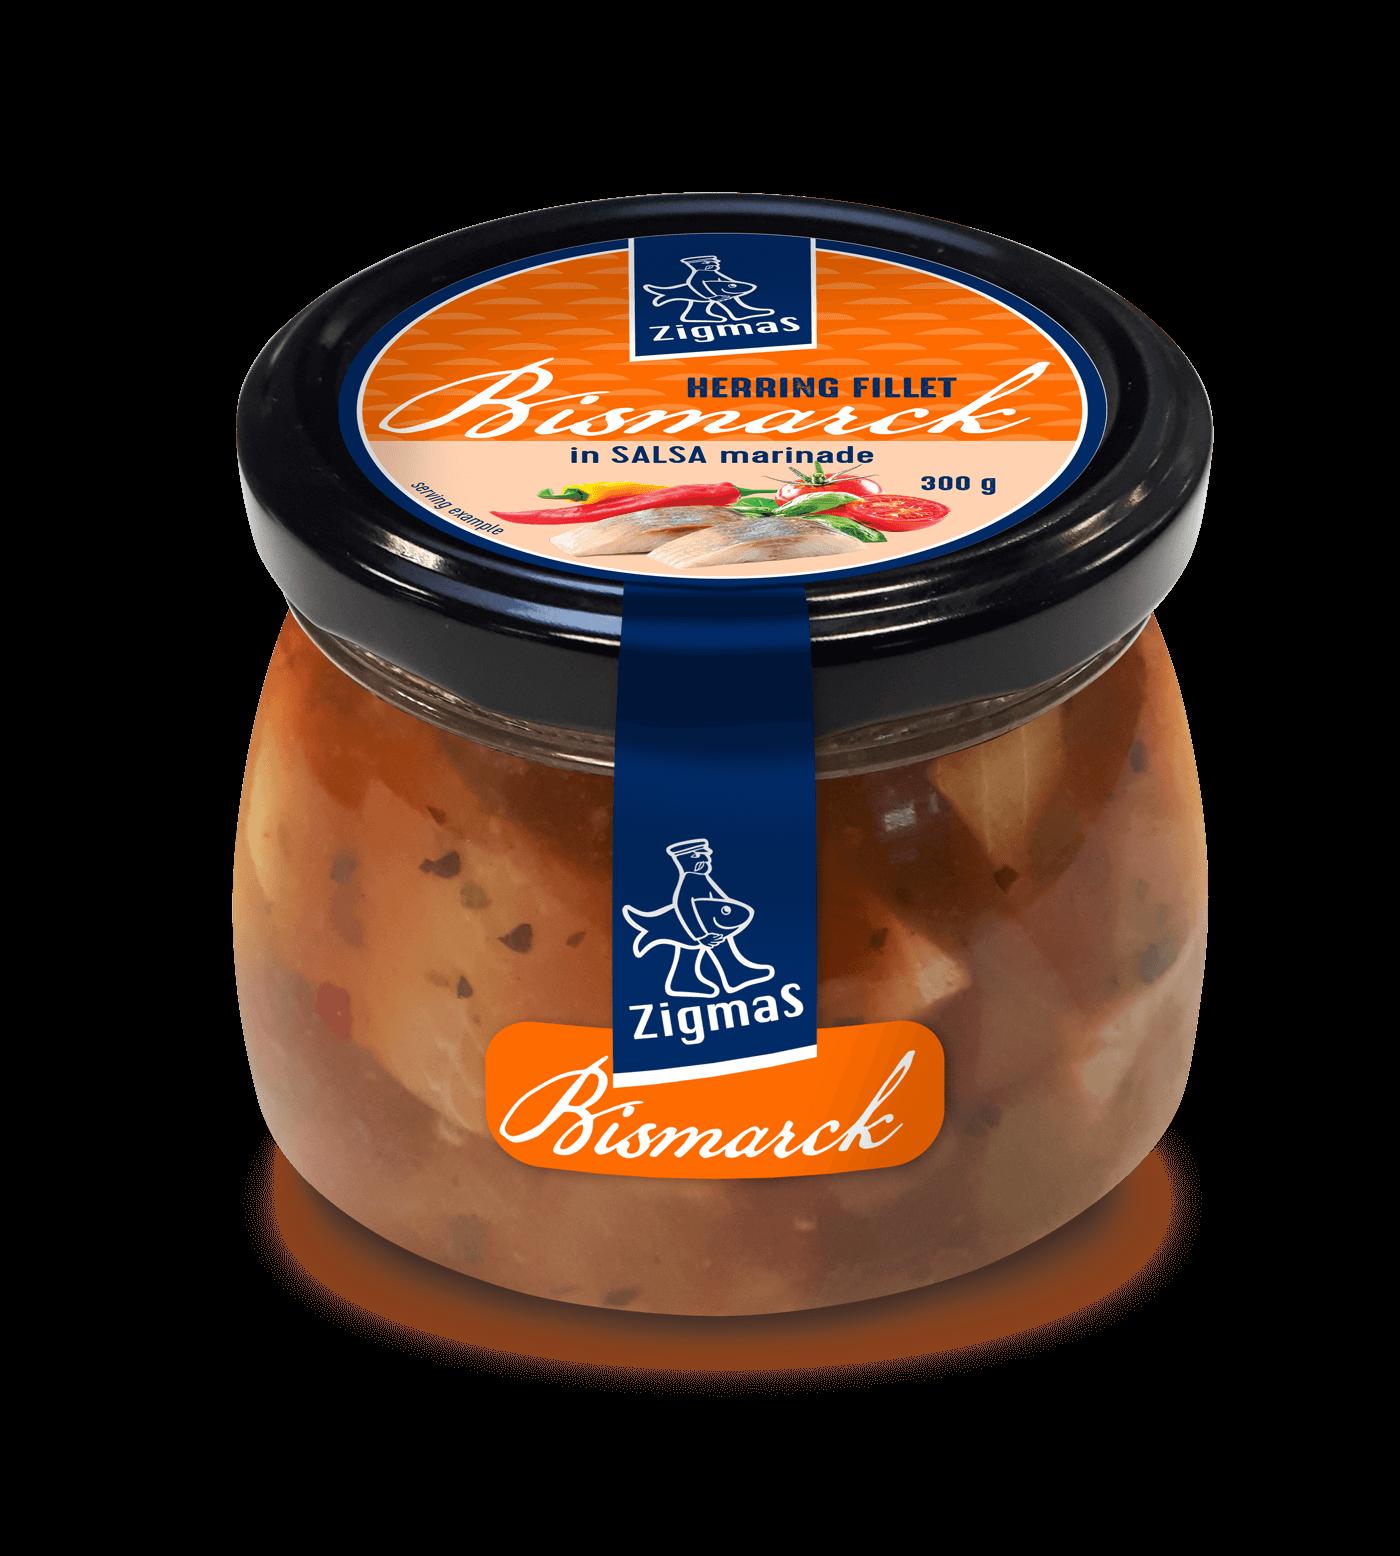 BISMARCK silkių filė salsa marinate